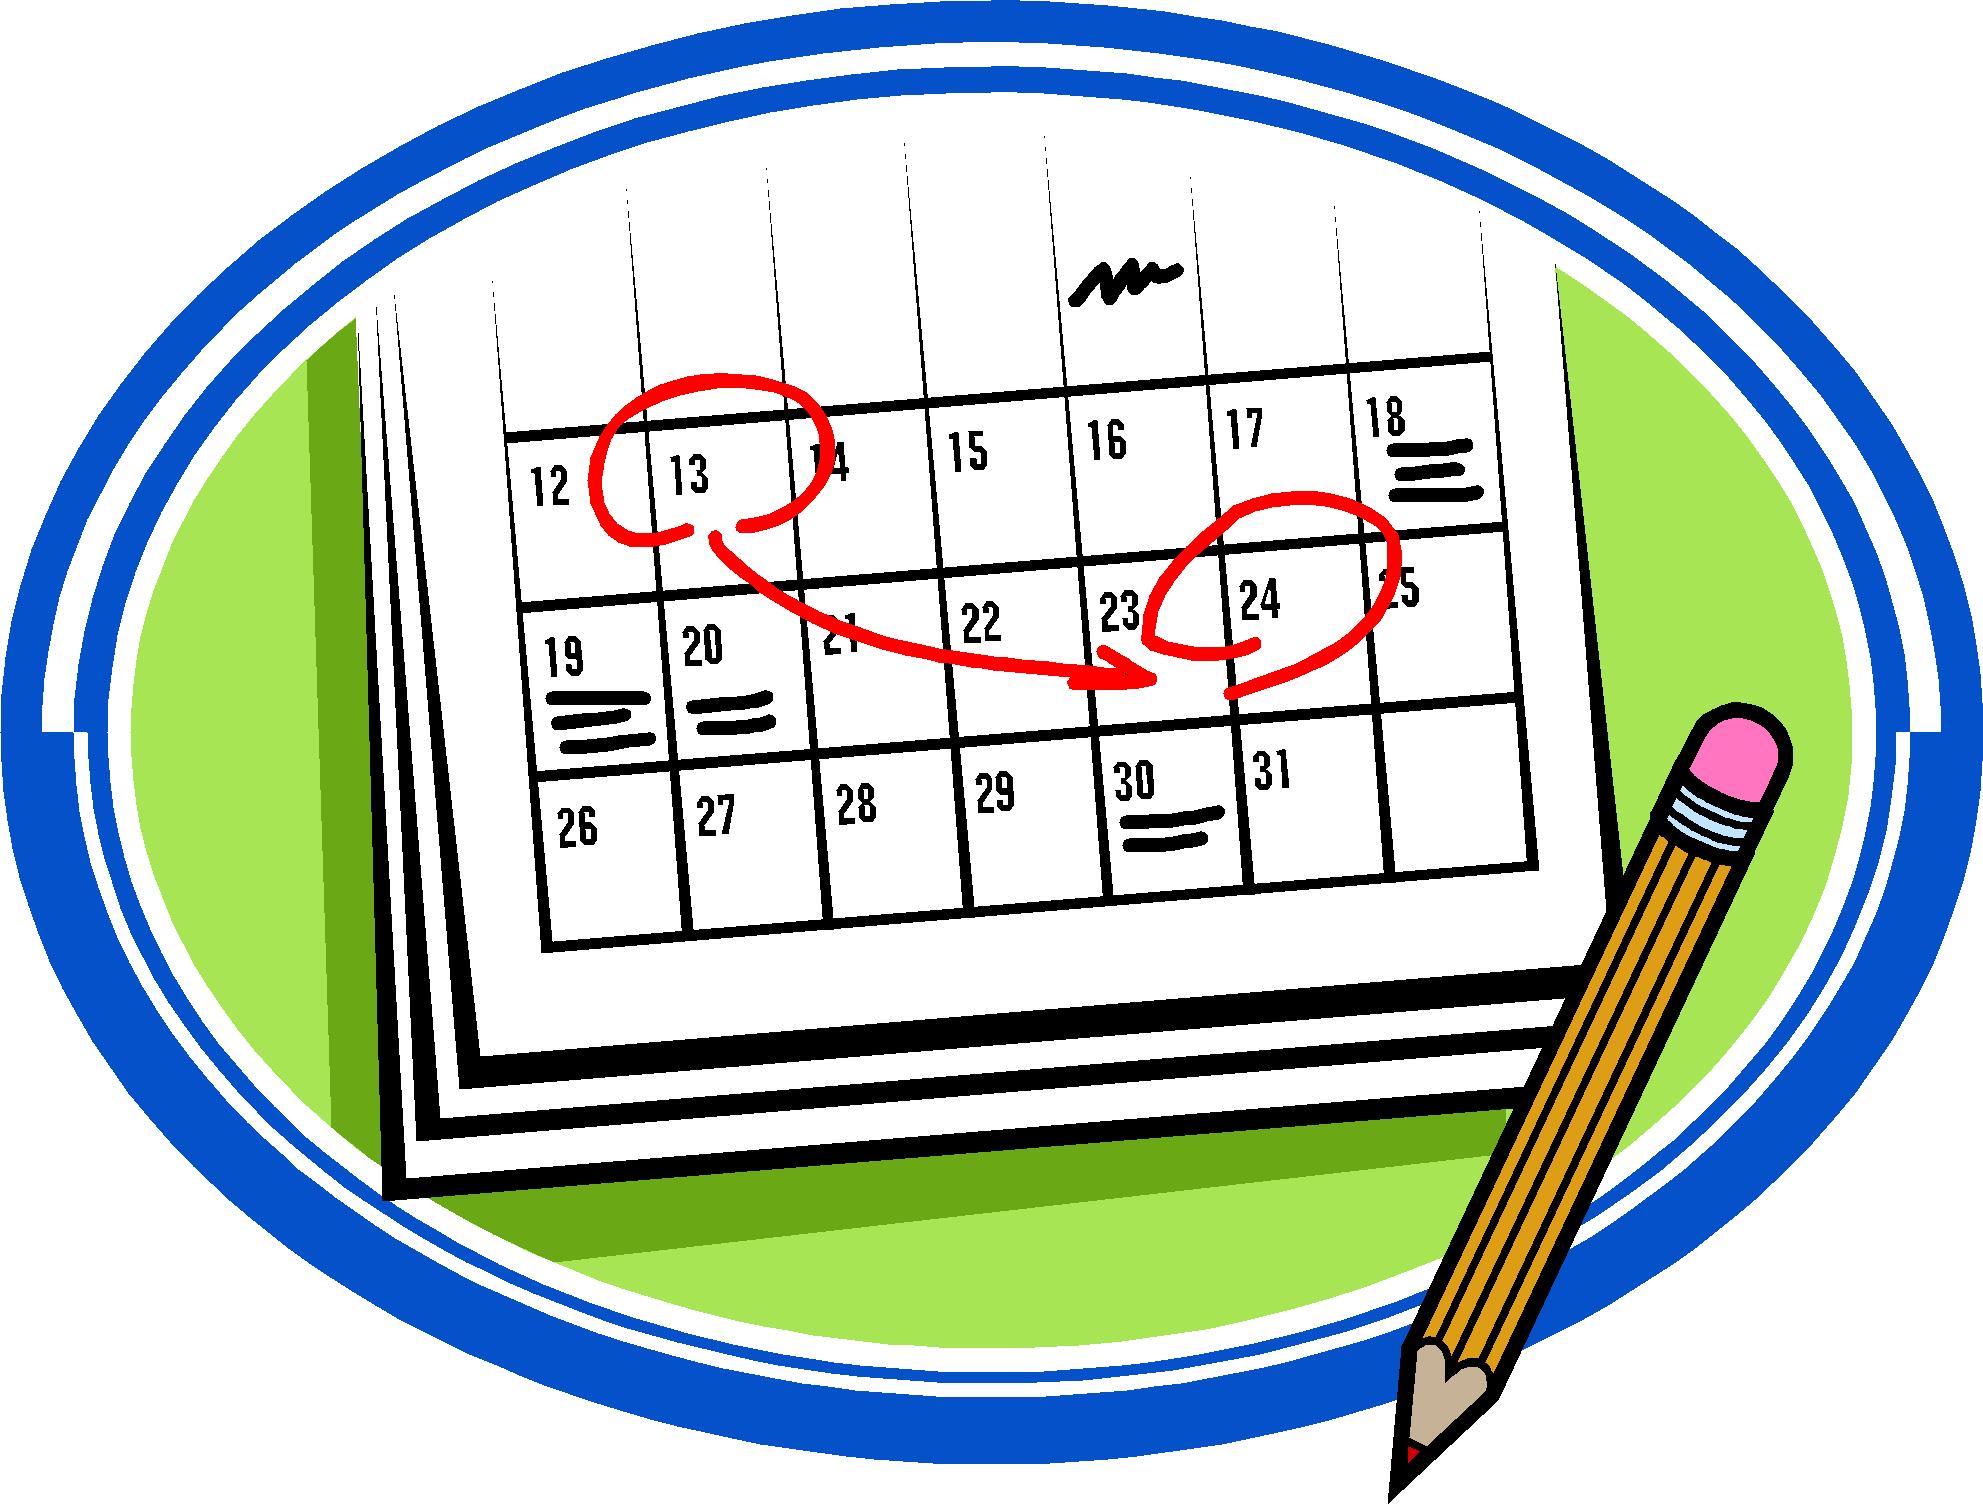 Calendar Clipart Dromfgn Top 2-Calendar clipart dromfgn top 2-9